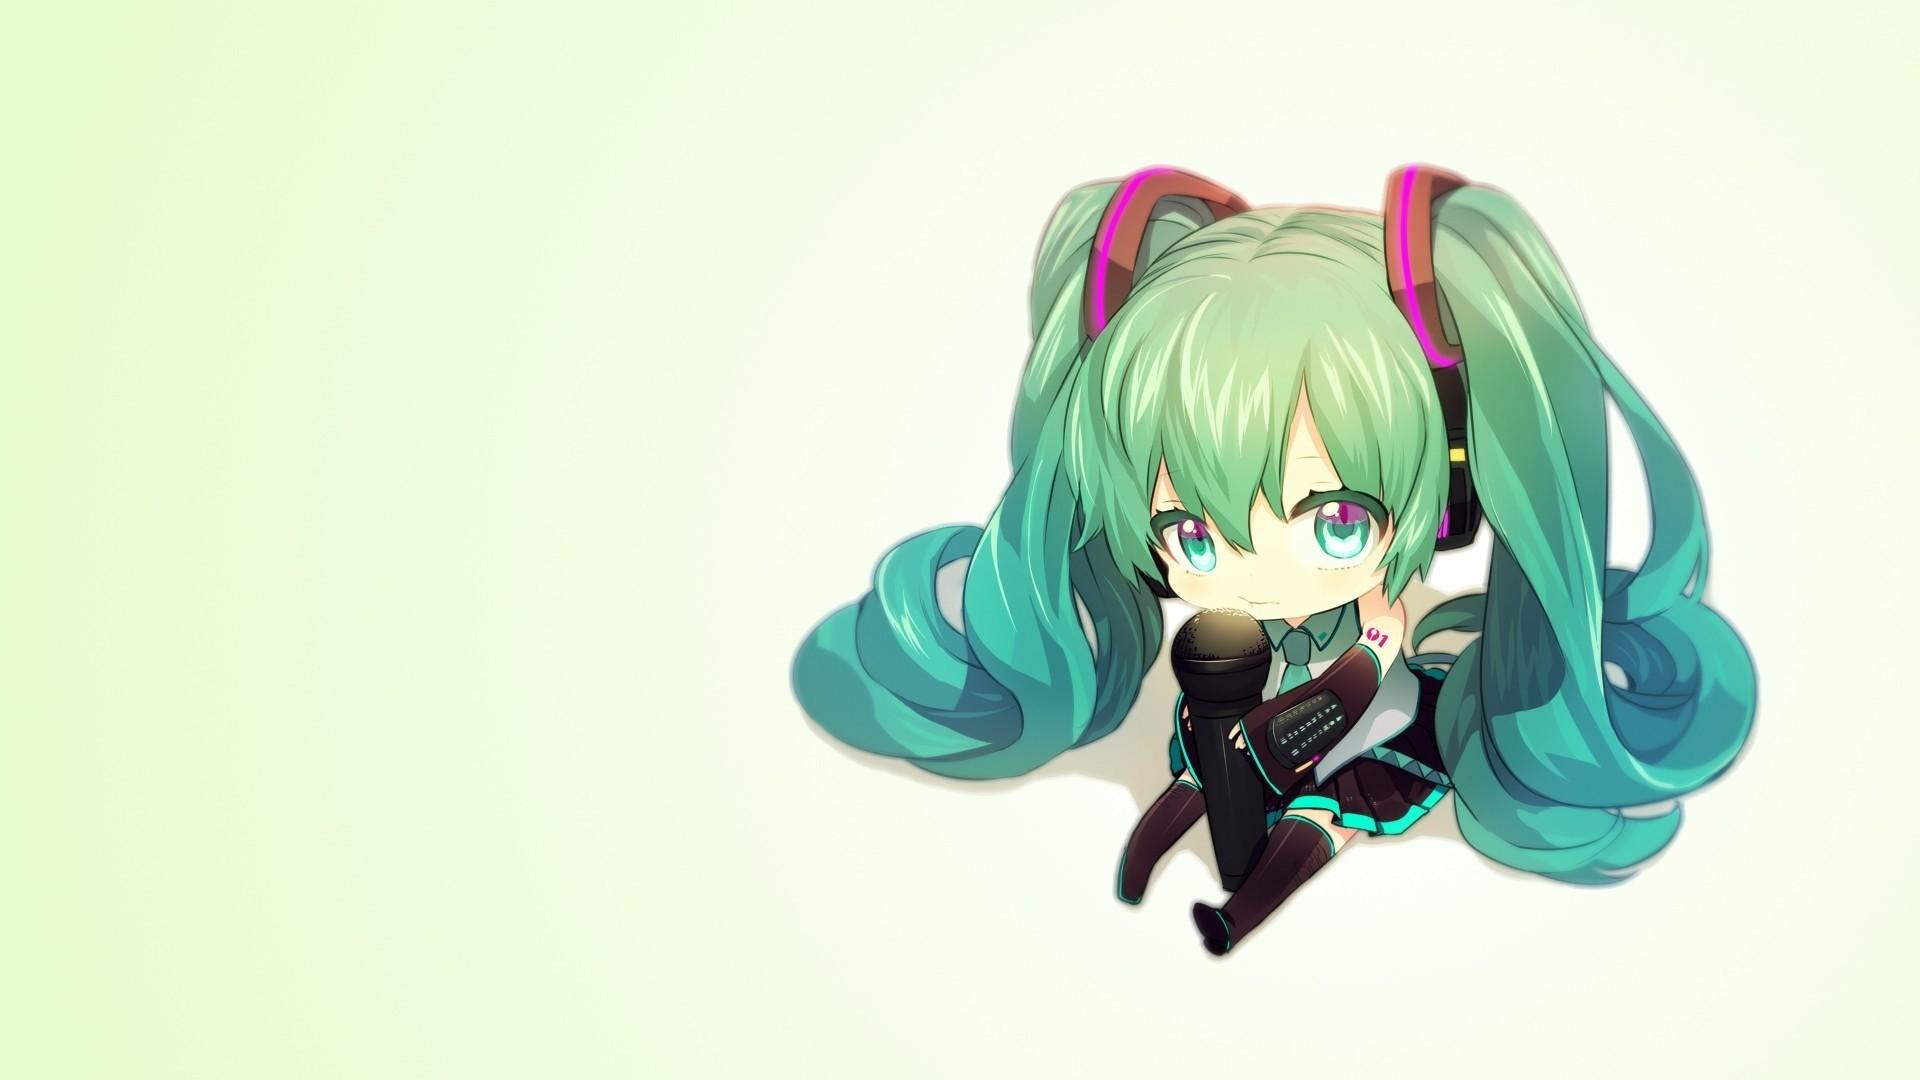 Chibi Anime Girl Wallpaper Picture hd